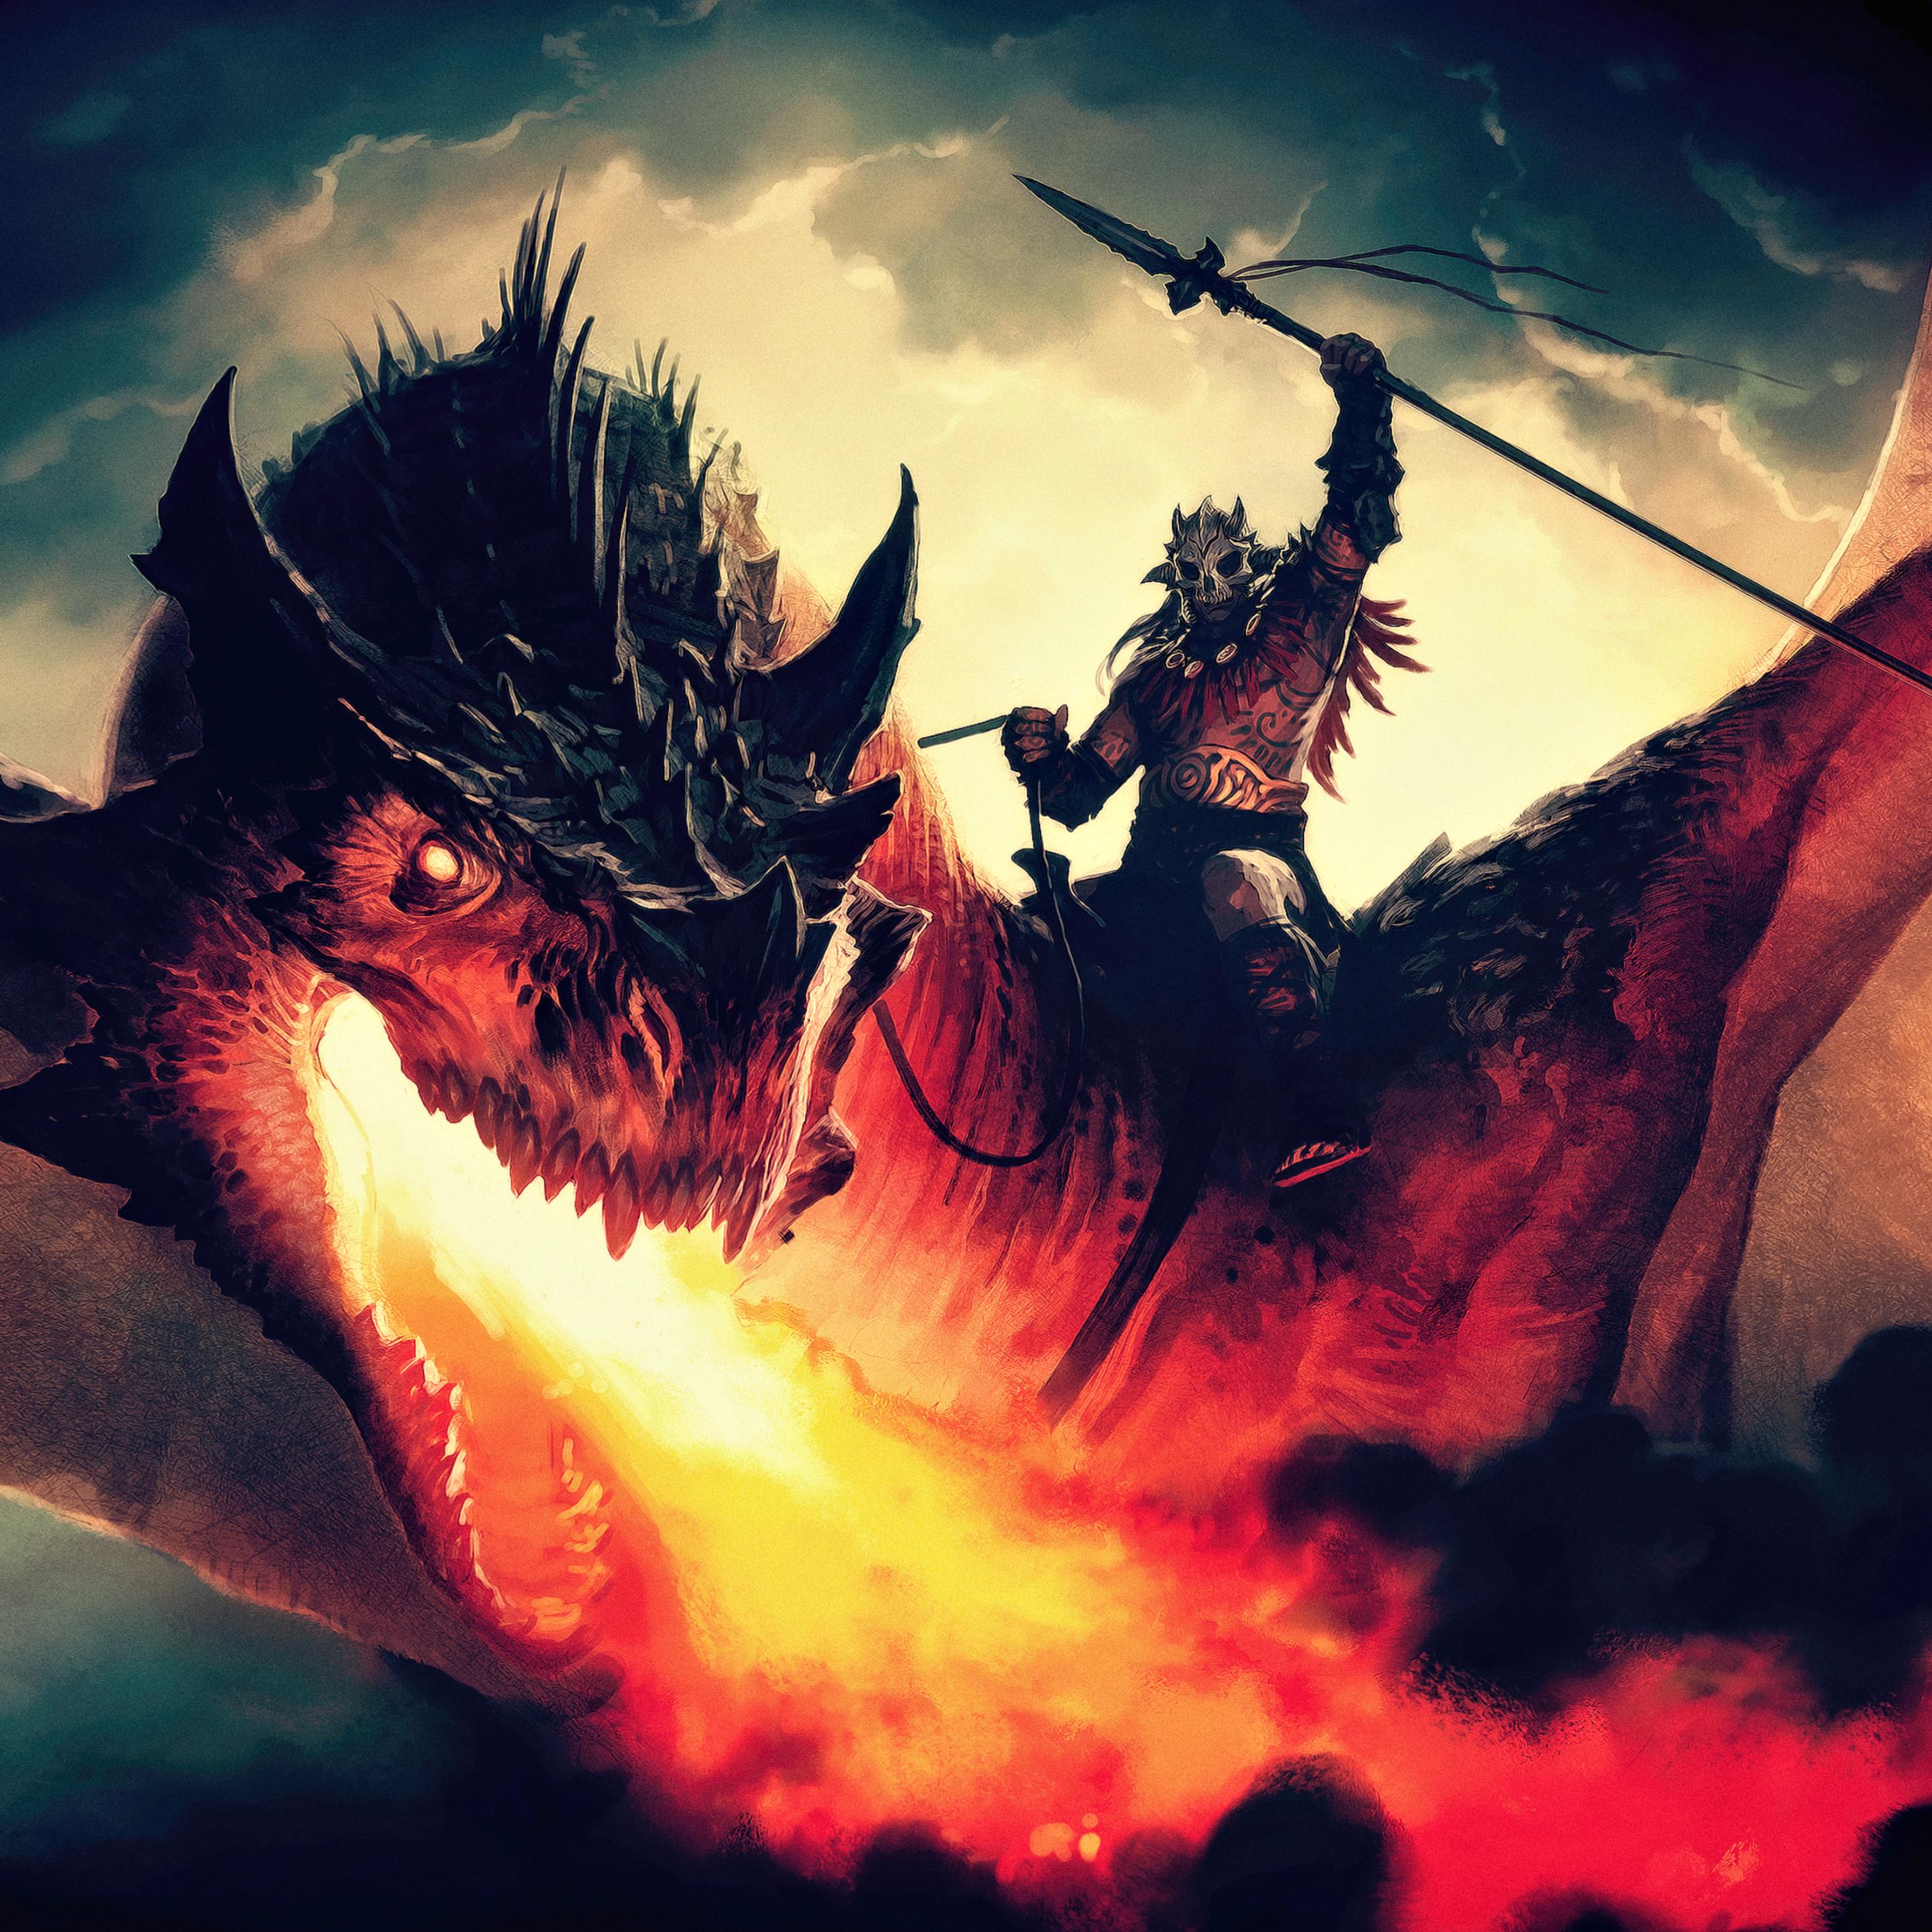 2932x2932 Magic The Gathering Arena Dragon Concept Art Ipad